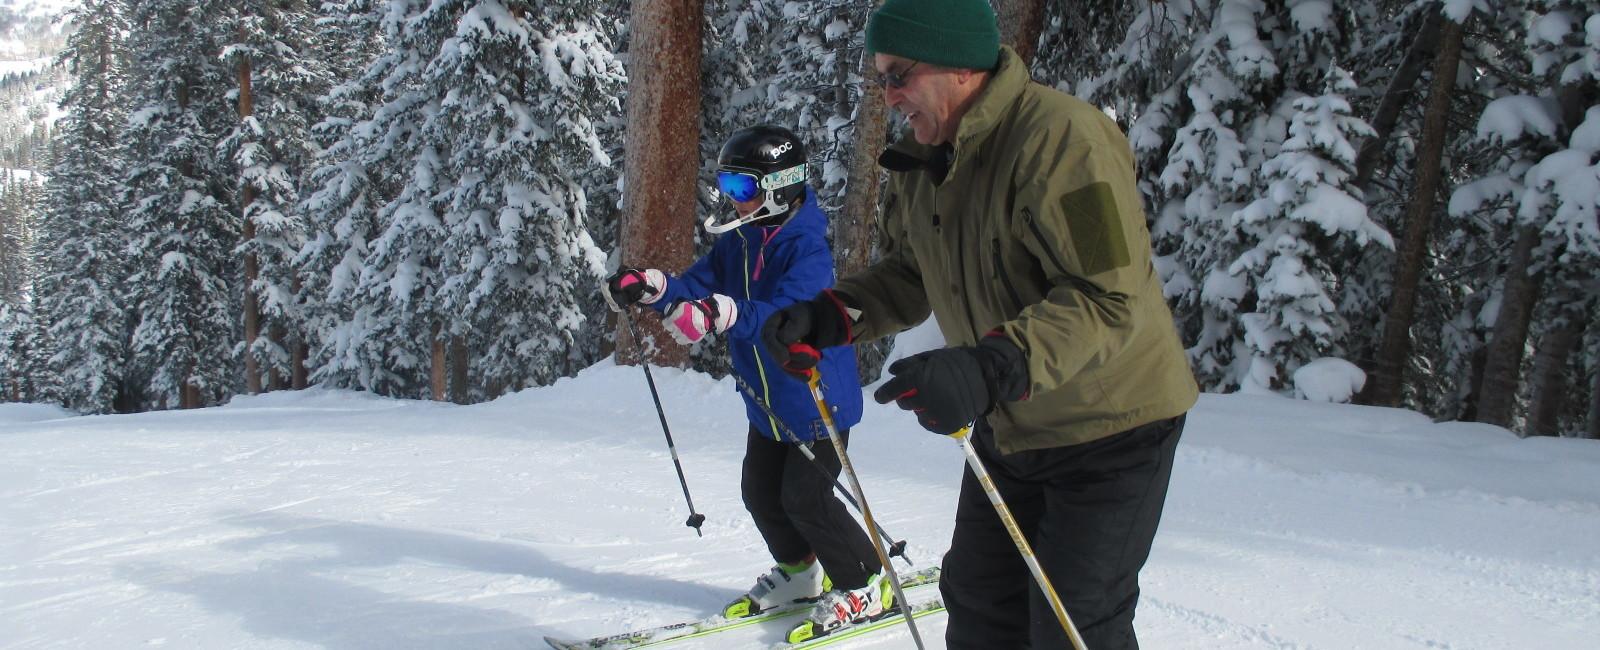 Ski tips for Grandpa-kids do the teaching!